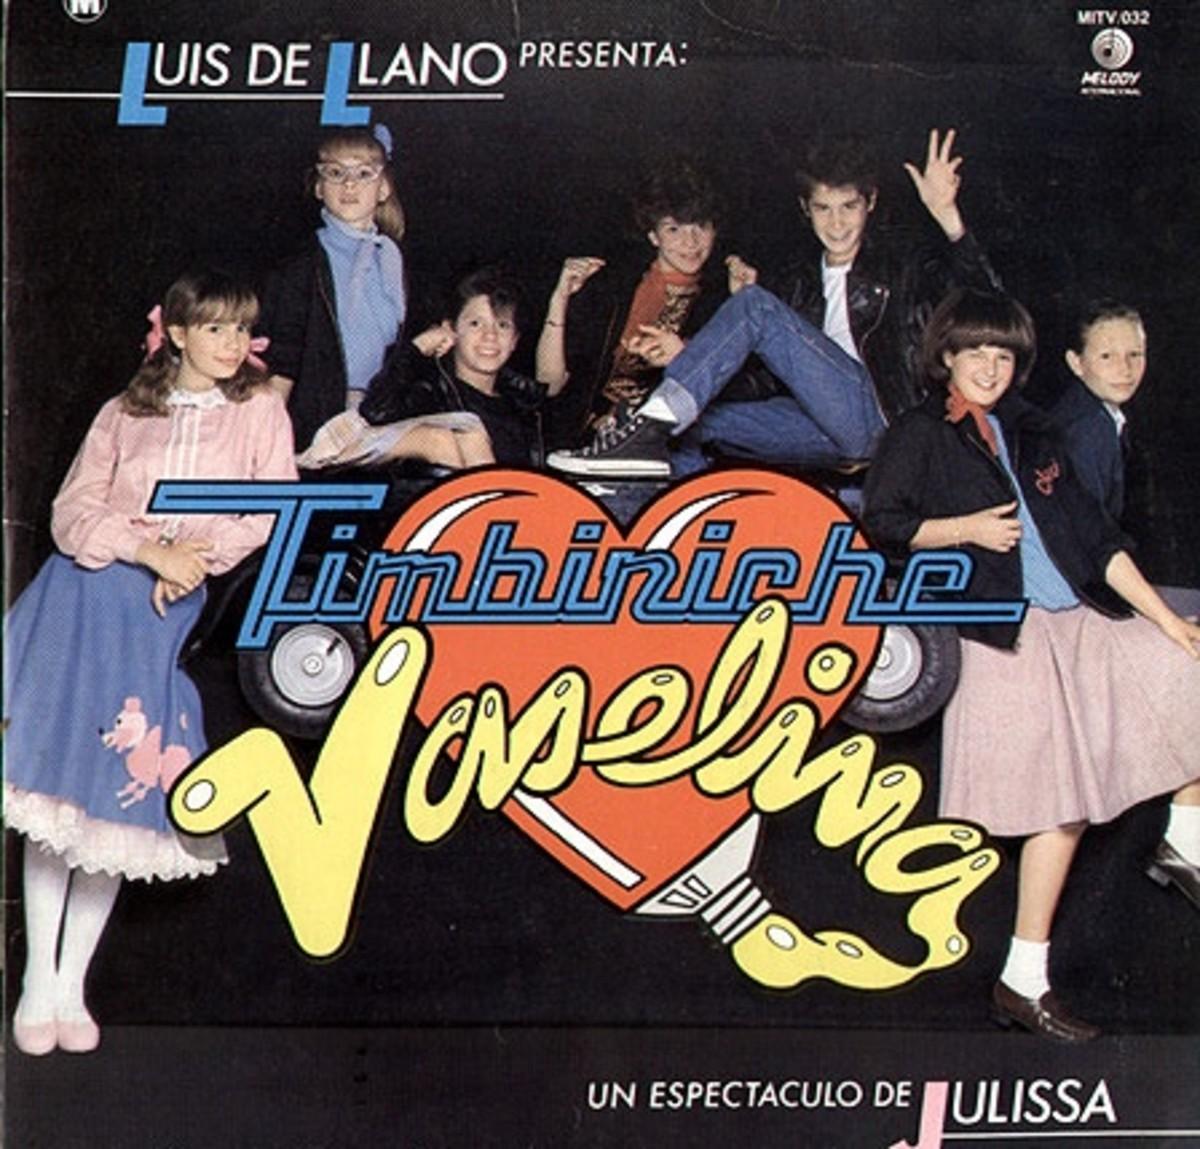 front album of their 1984 album Vaselina (Grease)